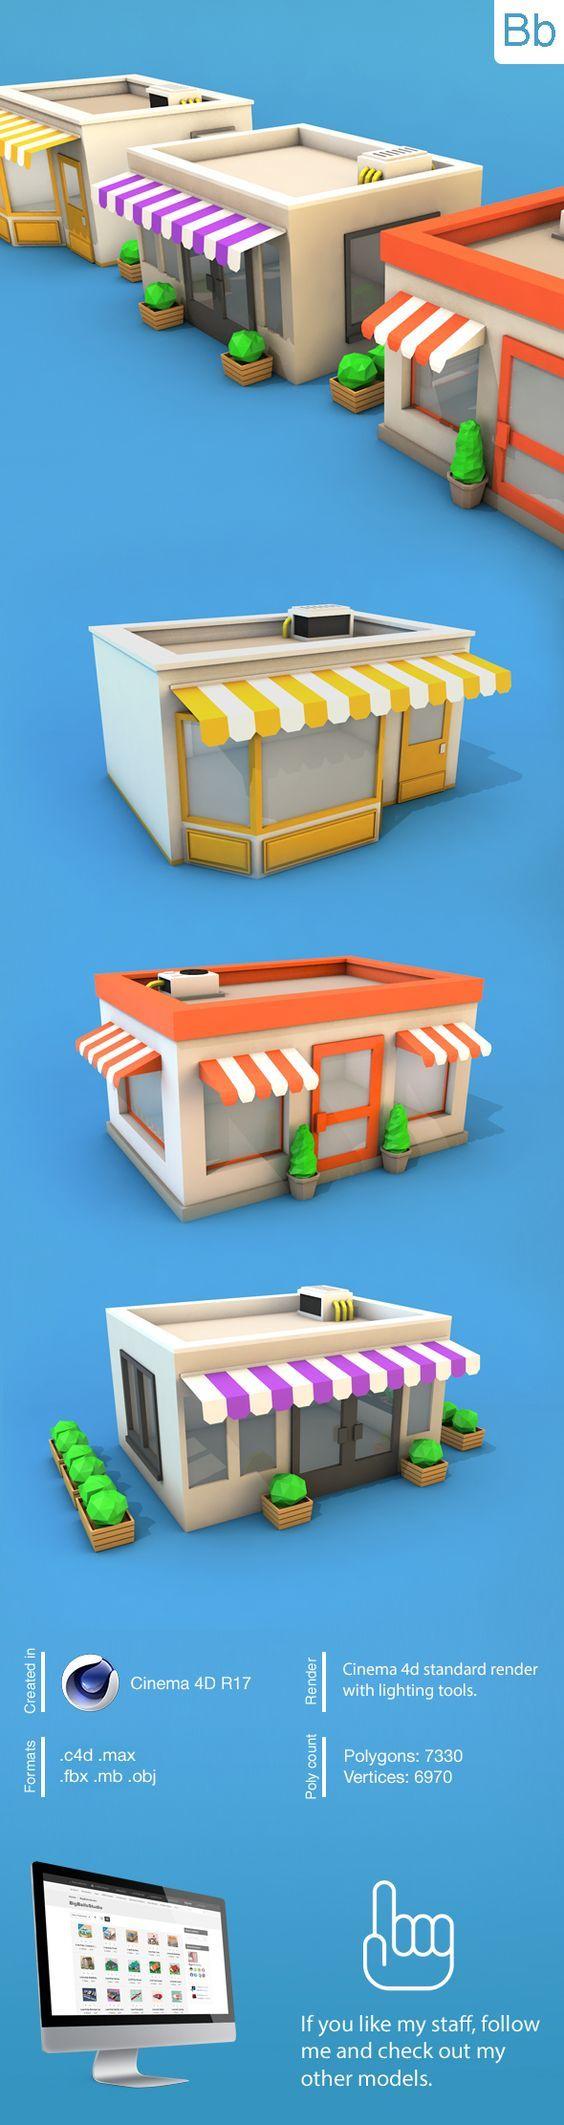 Low Poly Buildings Pack Download 3D Model(s) Formats: max, maya, c4d, blend, fbx, obj